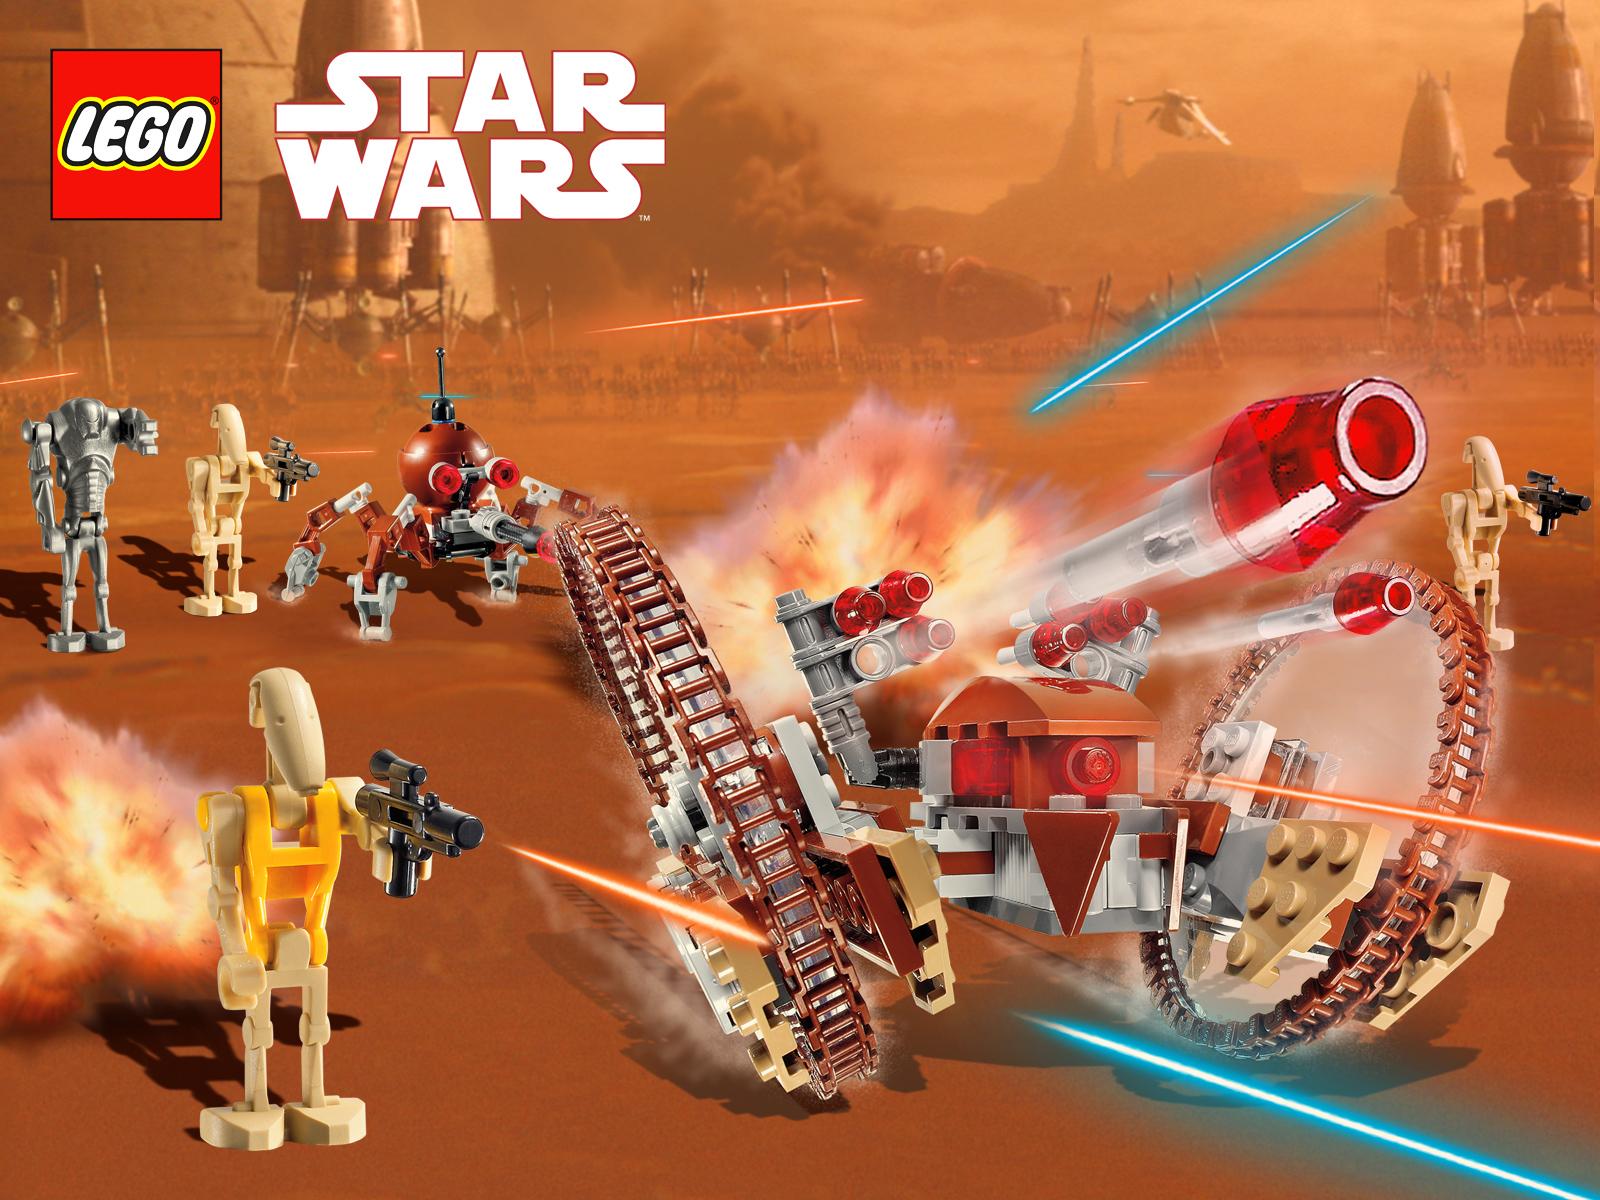 Lego Star Wars 7670 , HD Wallpaper & Backgrounds